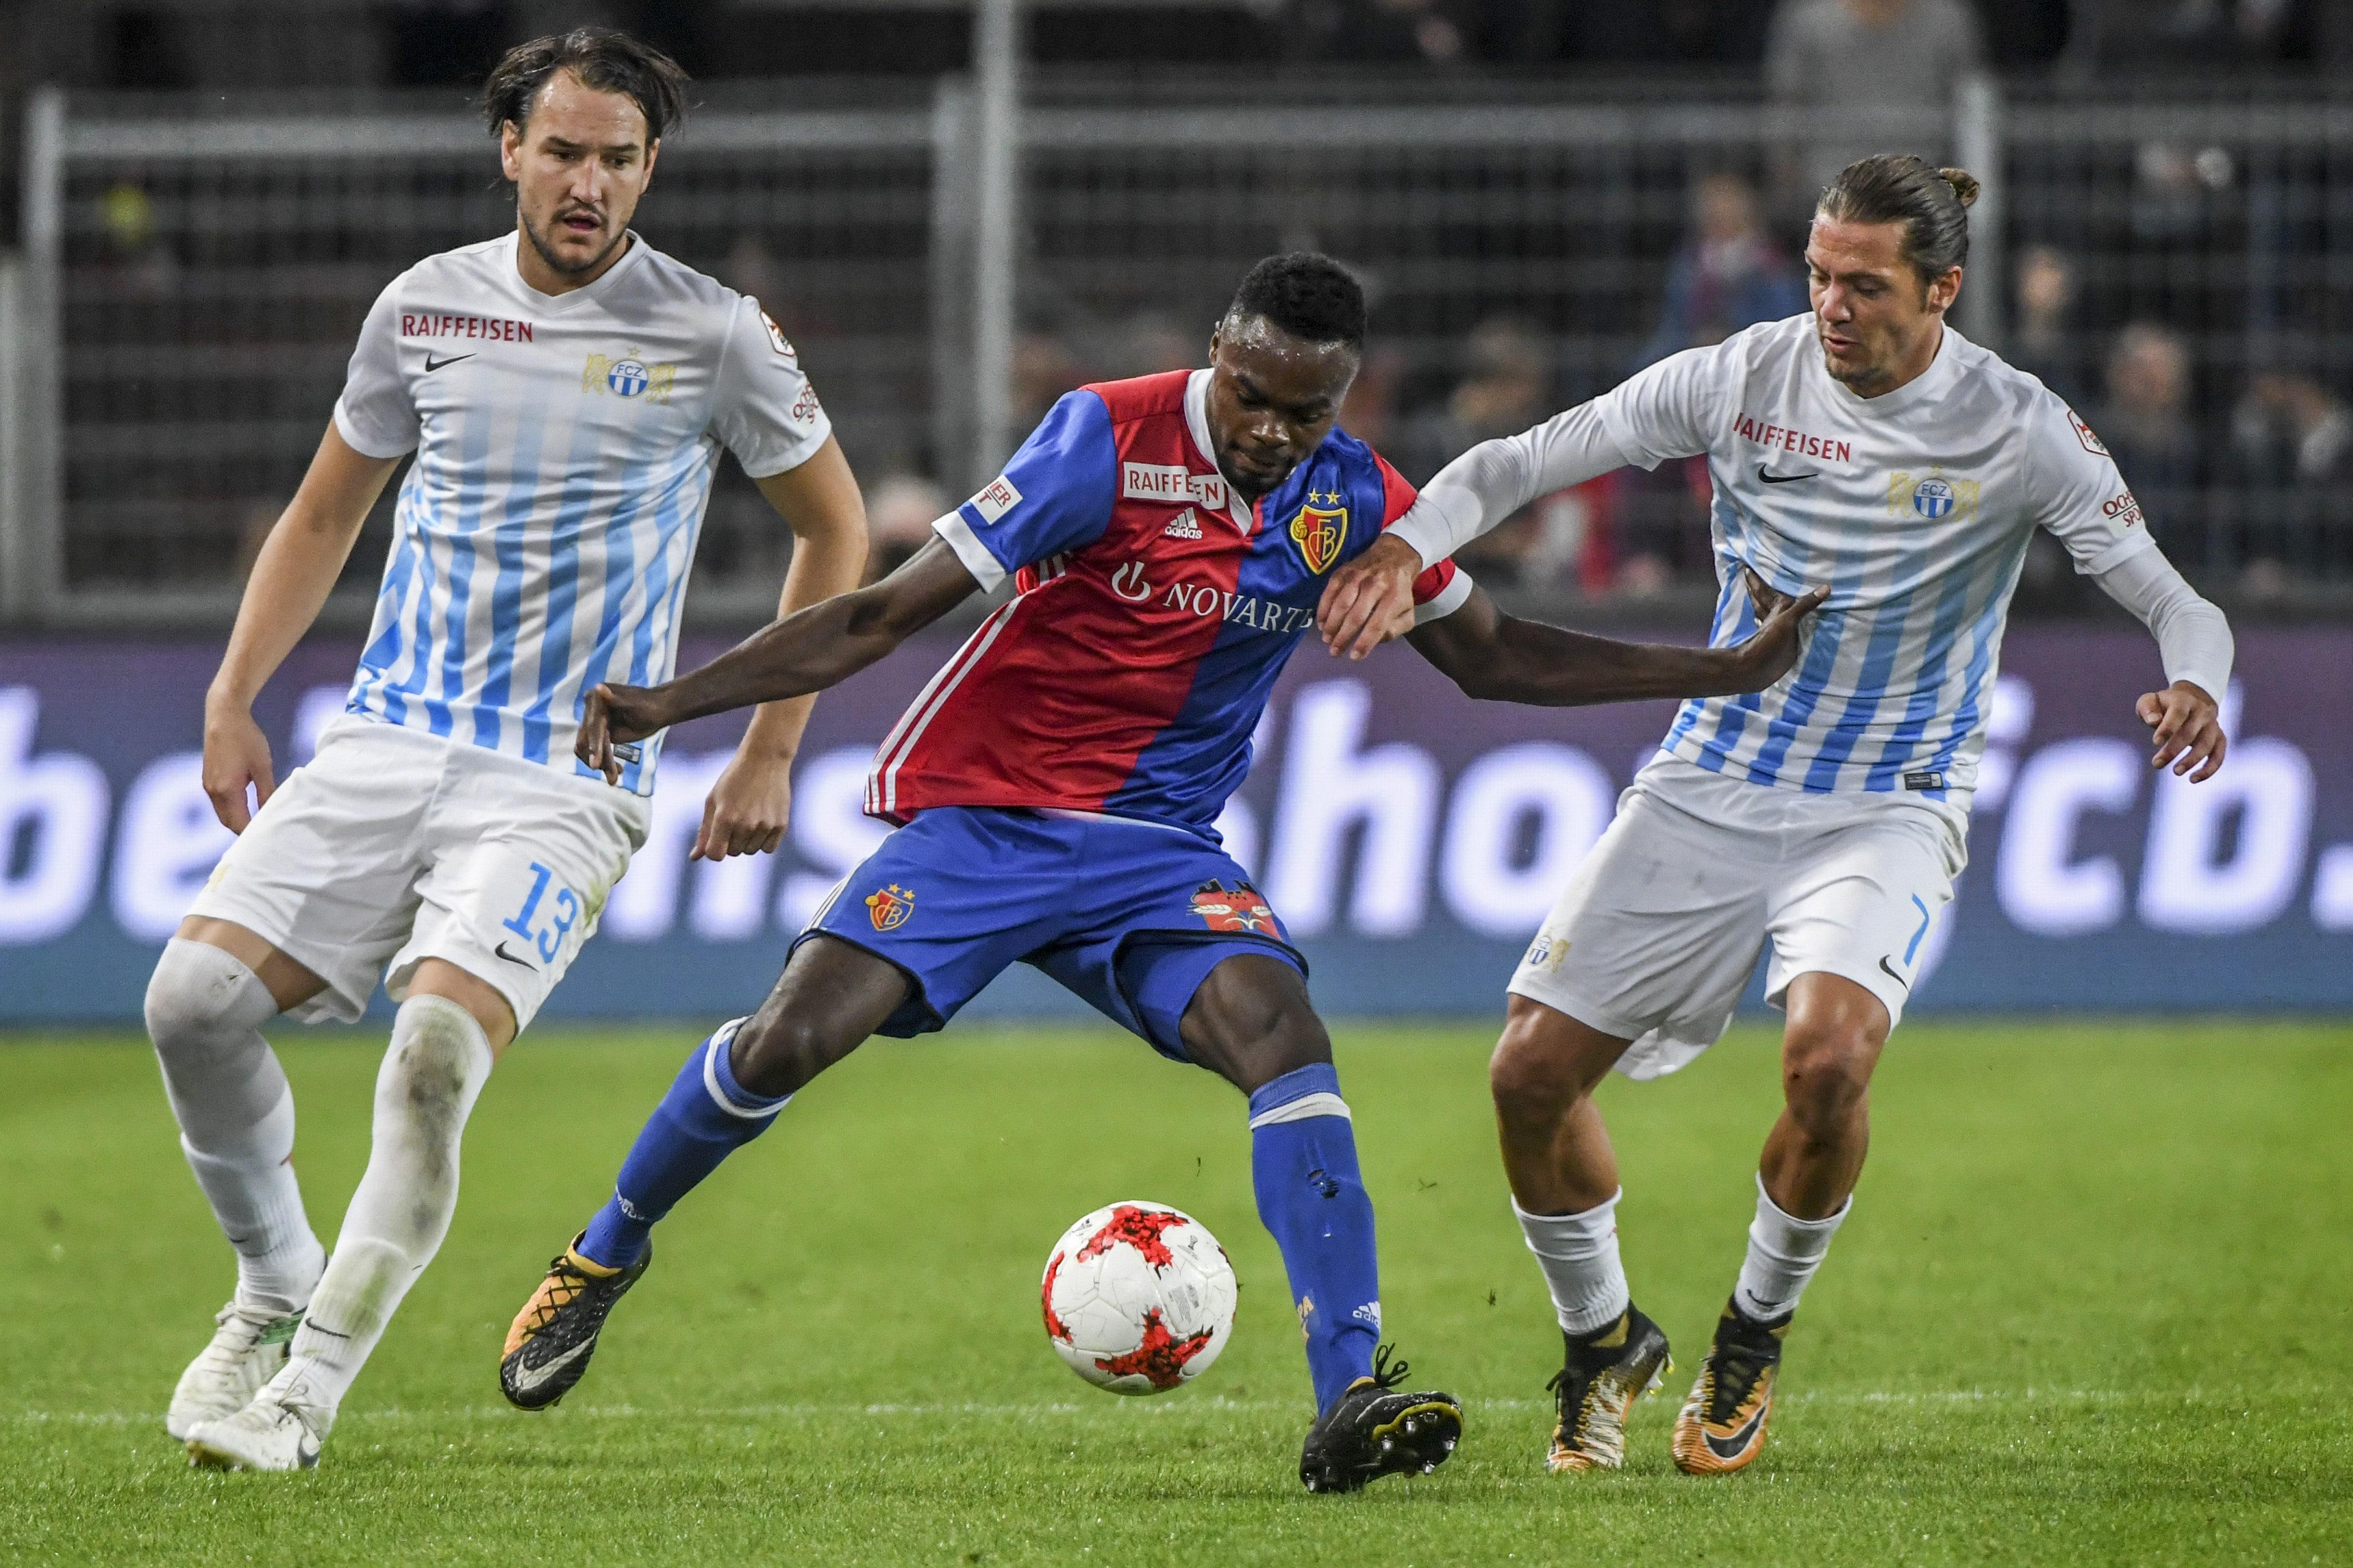 23.09.2017; Basel; FUSSBALL SUPER LEAGUE - FC Basel - FC Zuerich;Alain Nef (Zuerich) Dimitri Oberlin (Basel) Adrian Winter (